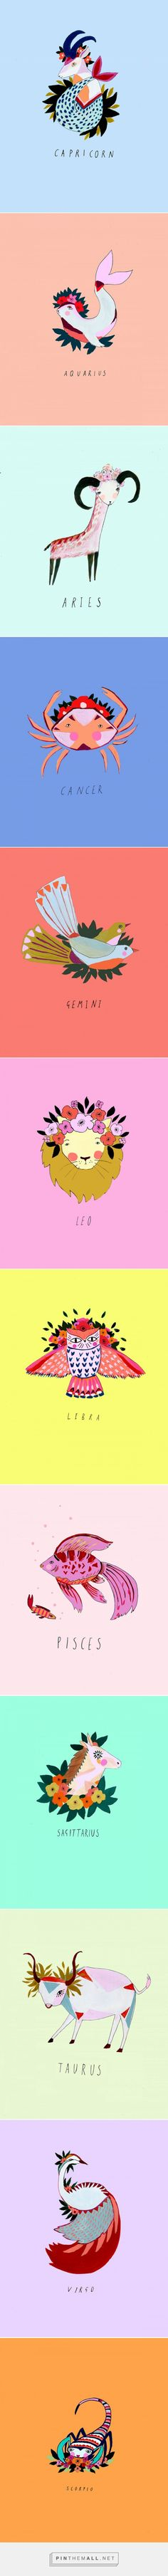 Zodiac Illustrations by Katy Smail